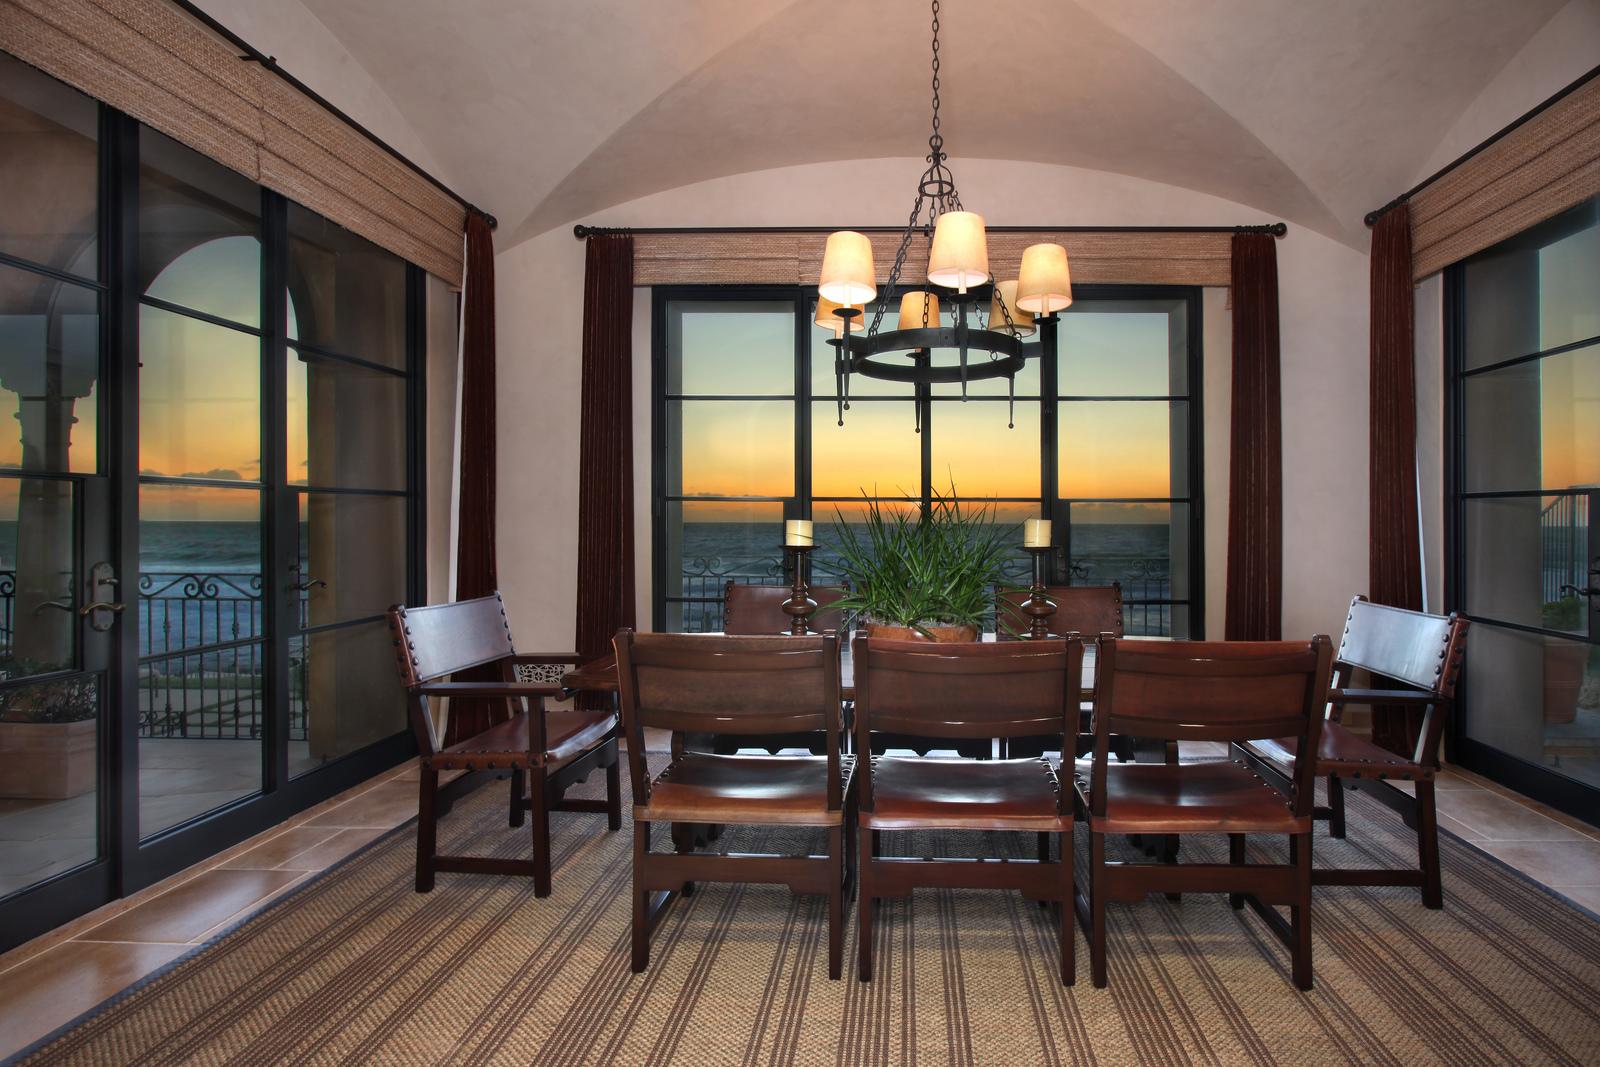 Luxury Ocean View Home California